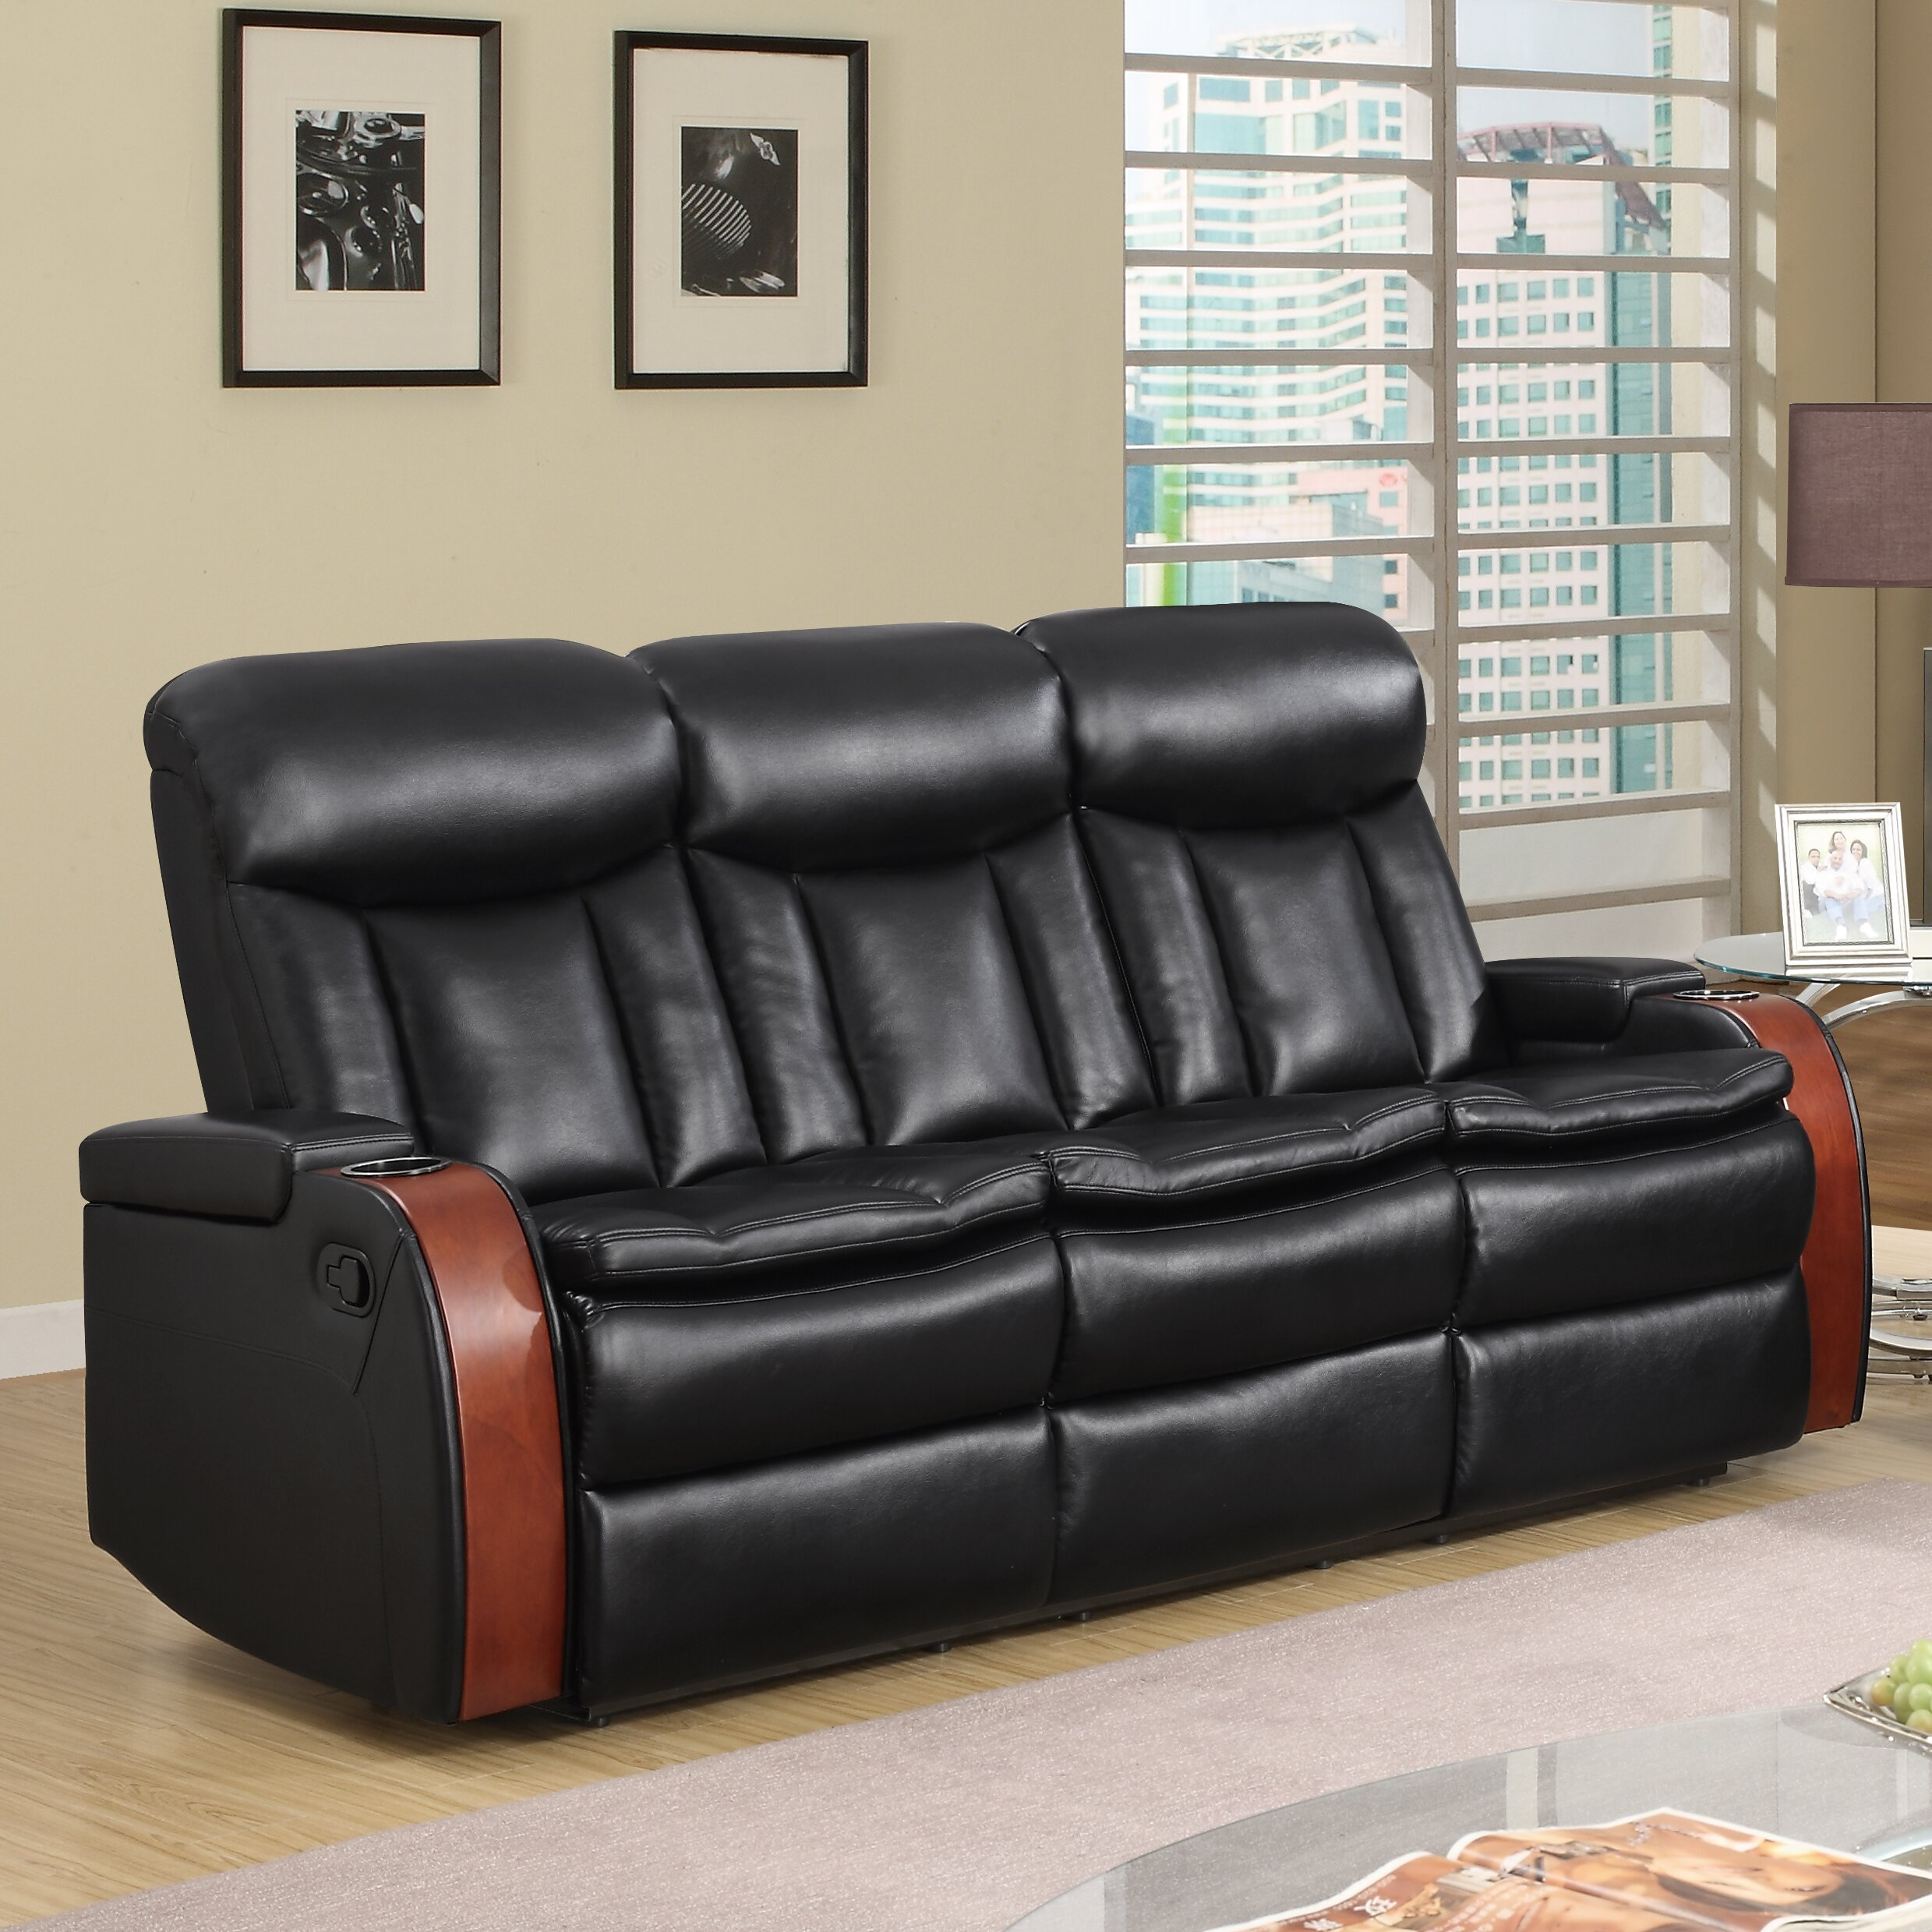 Global furniture usa blanche reclining sofa wayfair for Buy sofa online usa